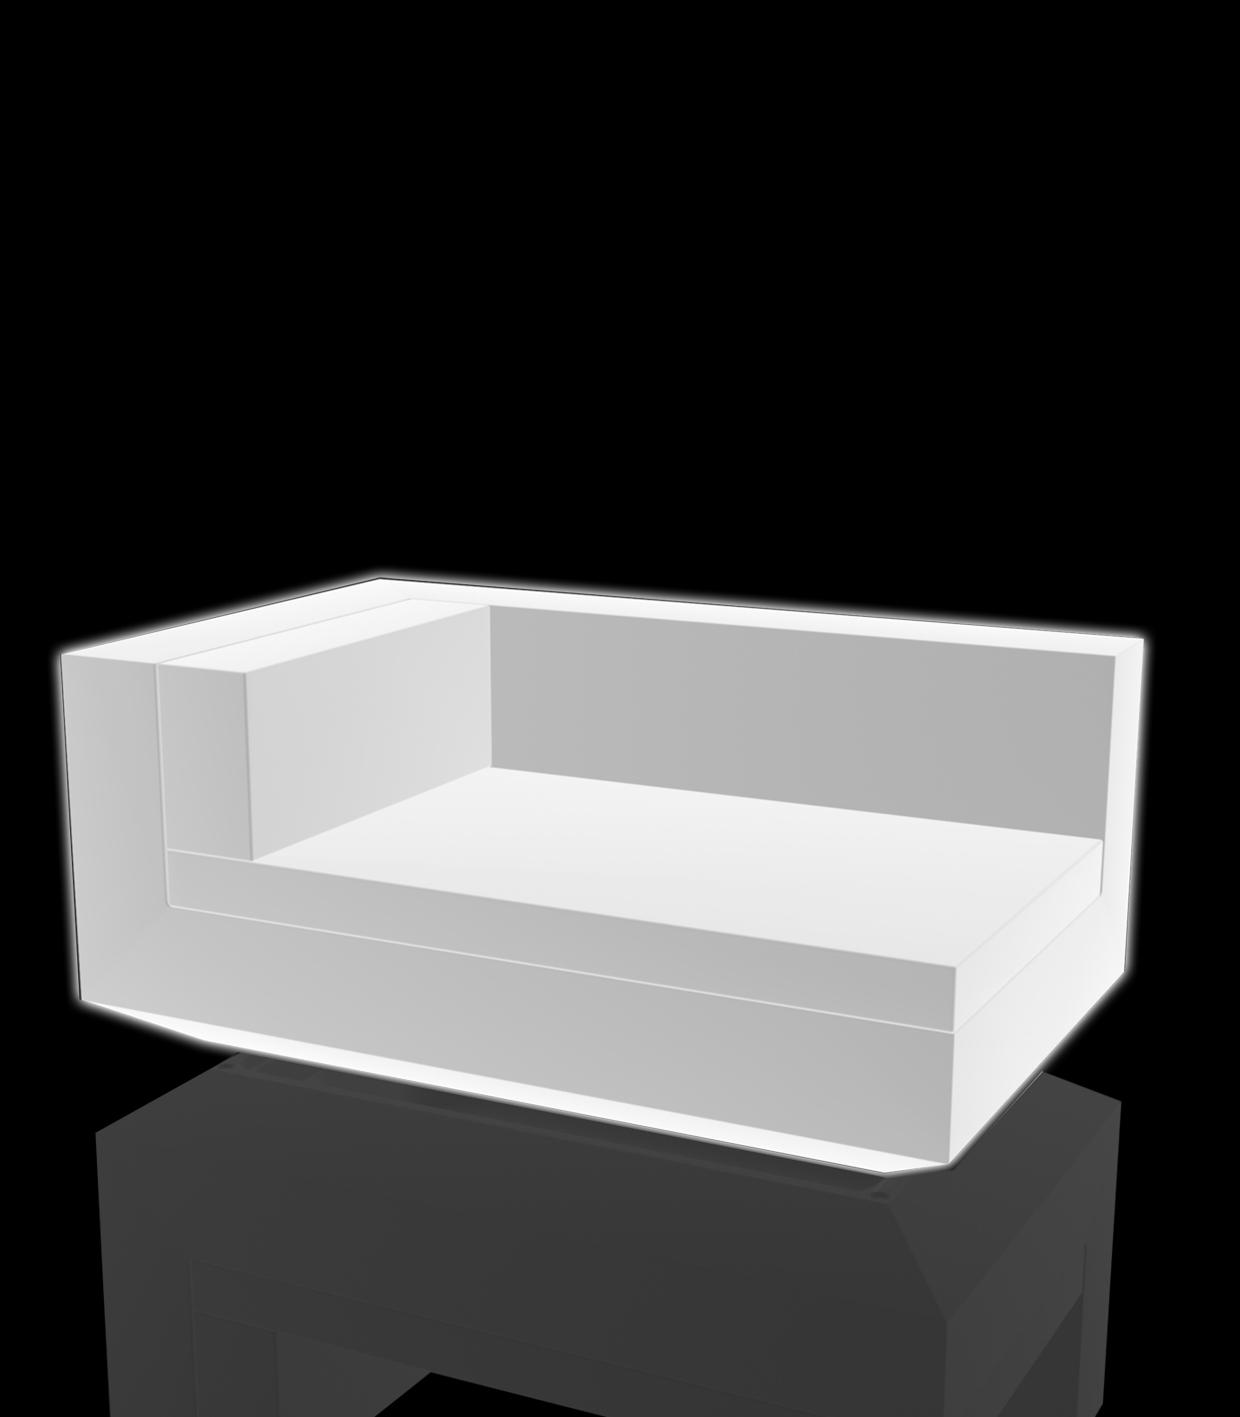 lighting chaise lounge adjustable vela sofa chaiselongue left module by vondom. Black Bedroom Furniture Sets. Home Design Ideas